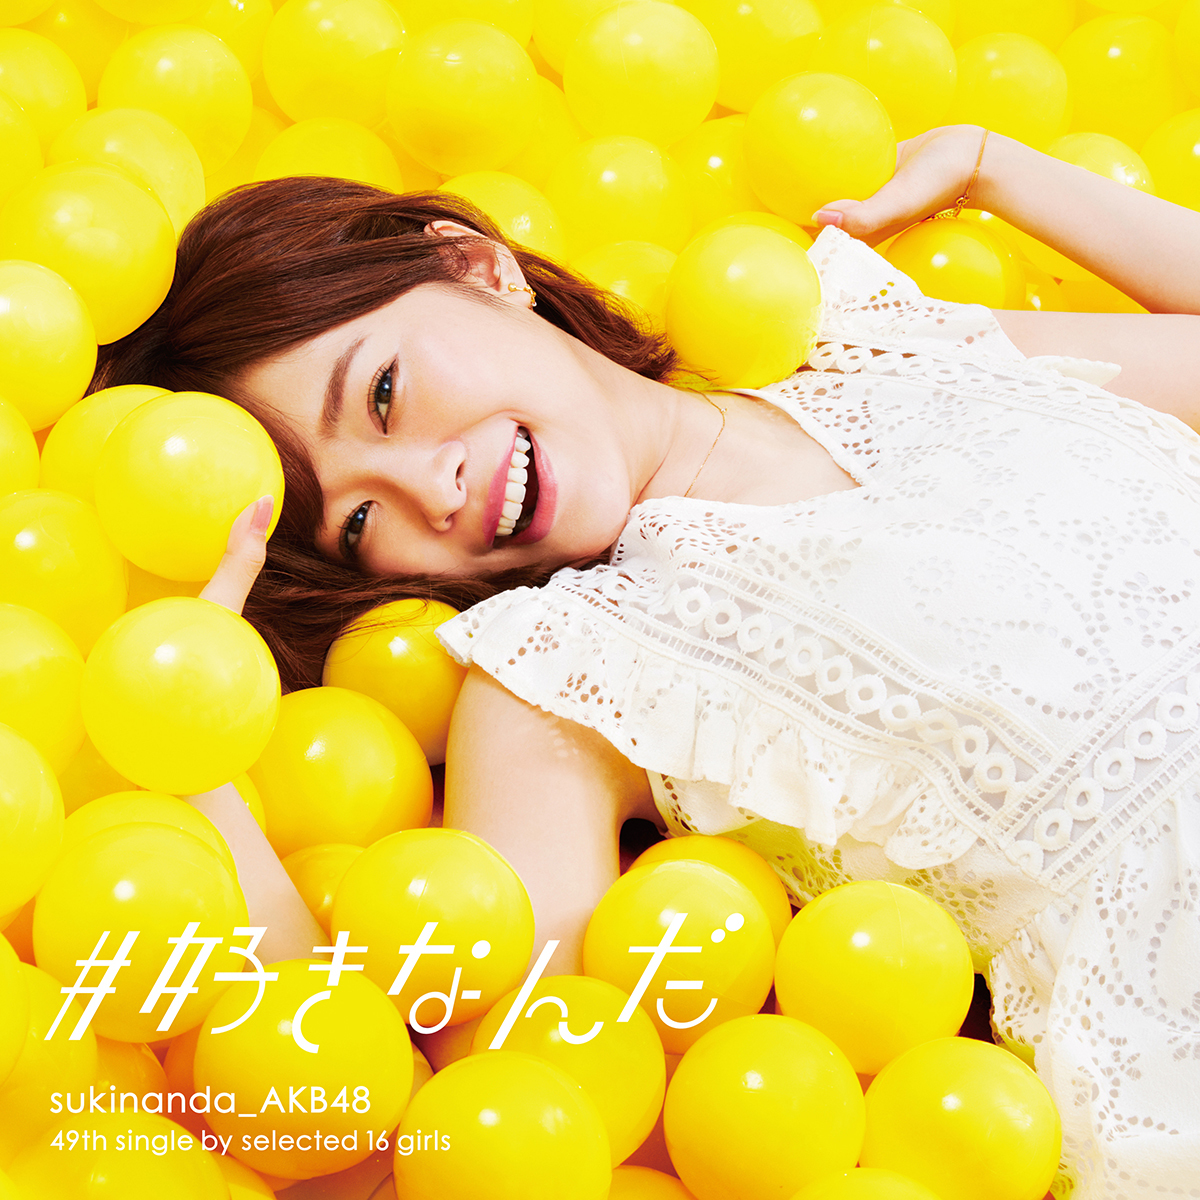 AKB48指原、横山、渡辺、荻野がSNSで意識している事とは…?